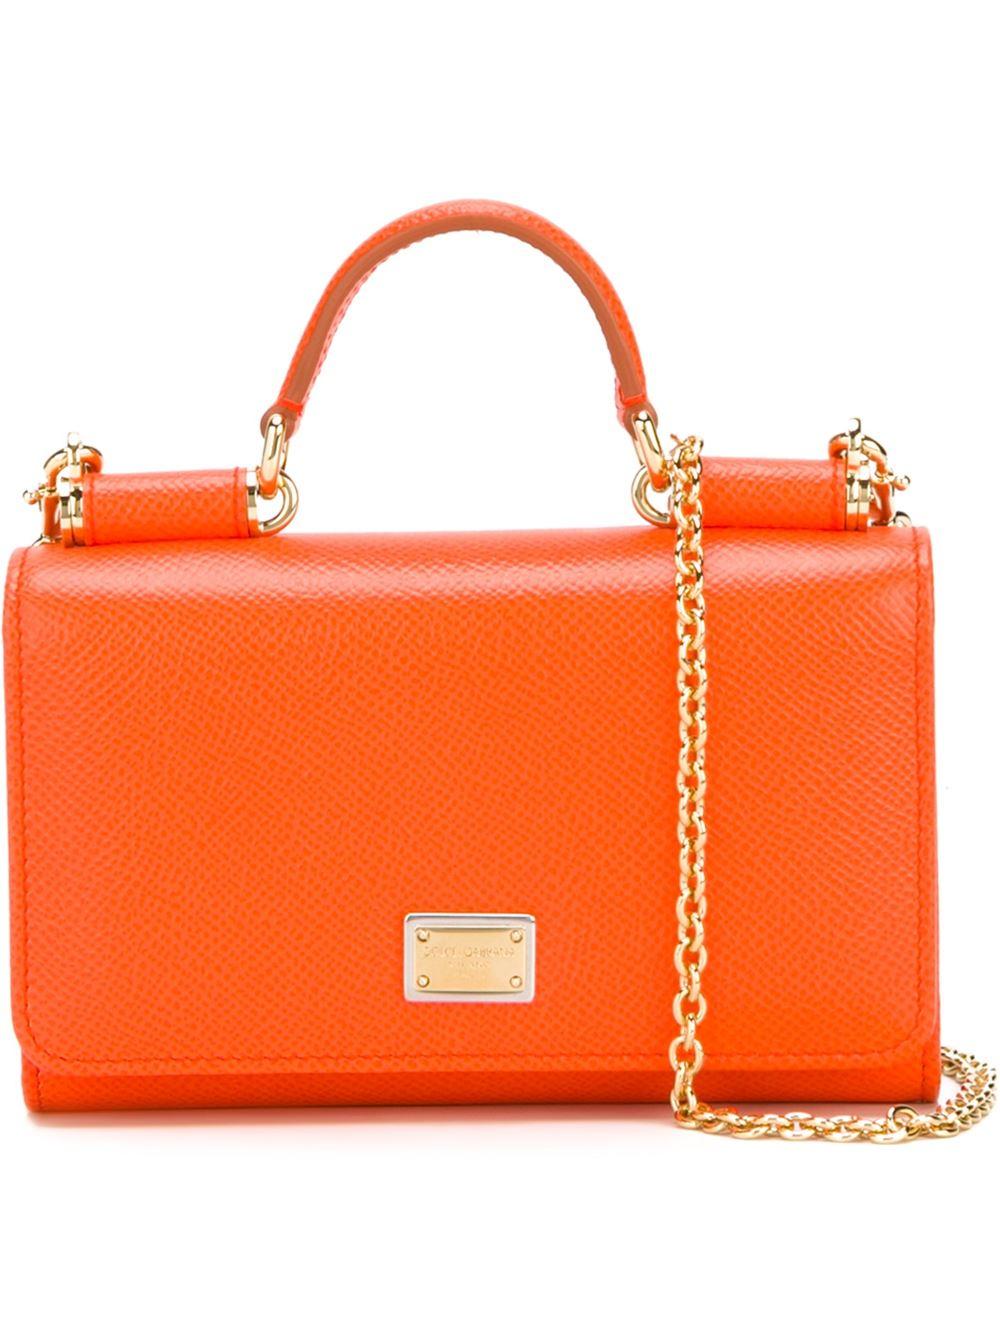 Lyst - Dolce   Gabbana Mini Phone Bag With Chain in Orange 21b0601b814e3